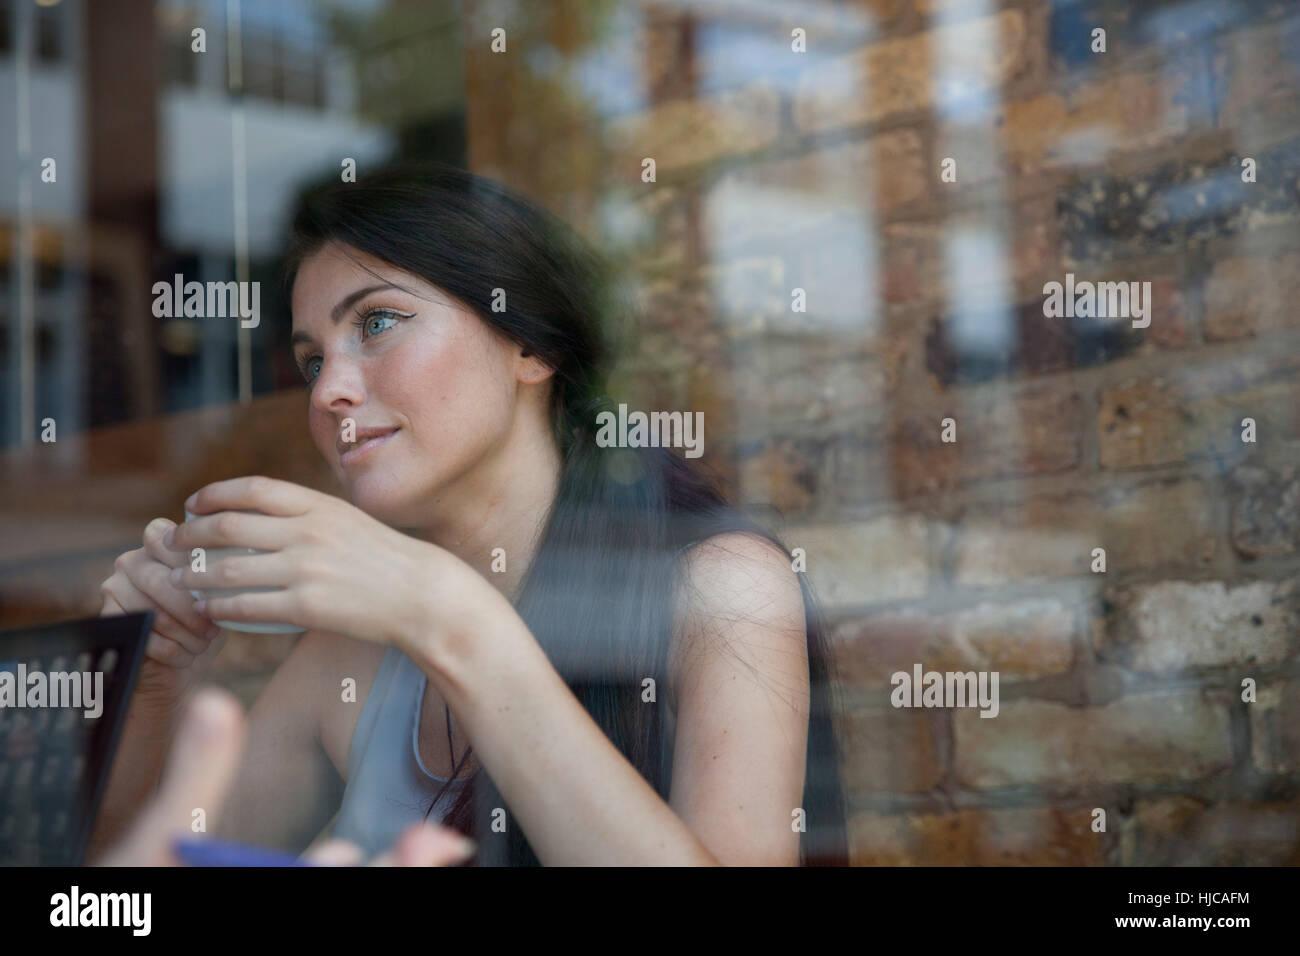 La empresaria haber reunido en el café bar, Londres Imagen De Stock